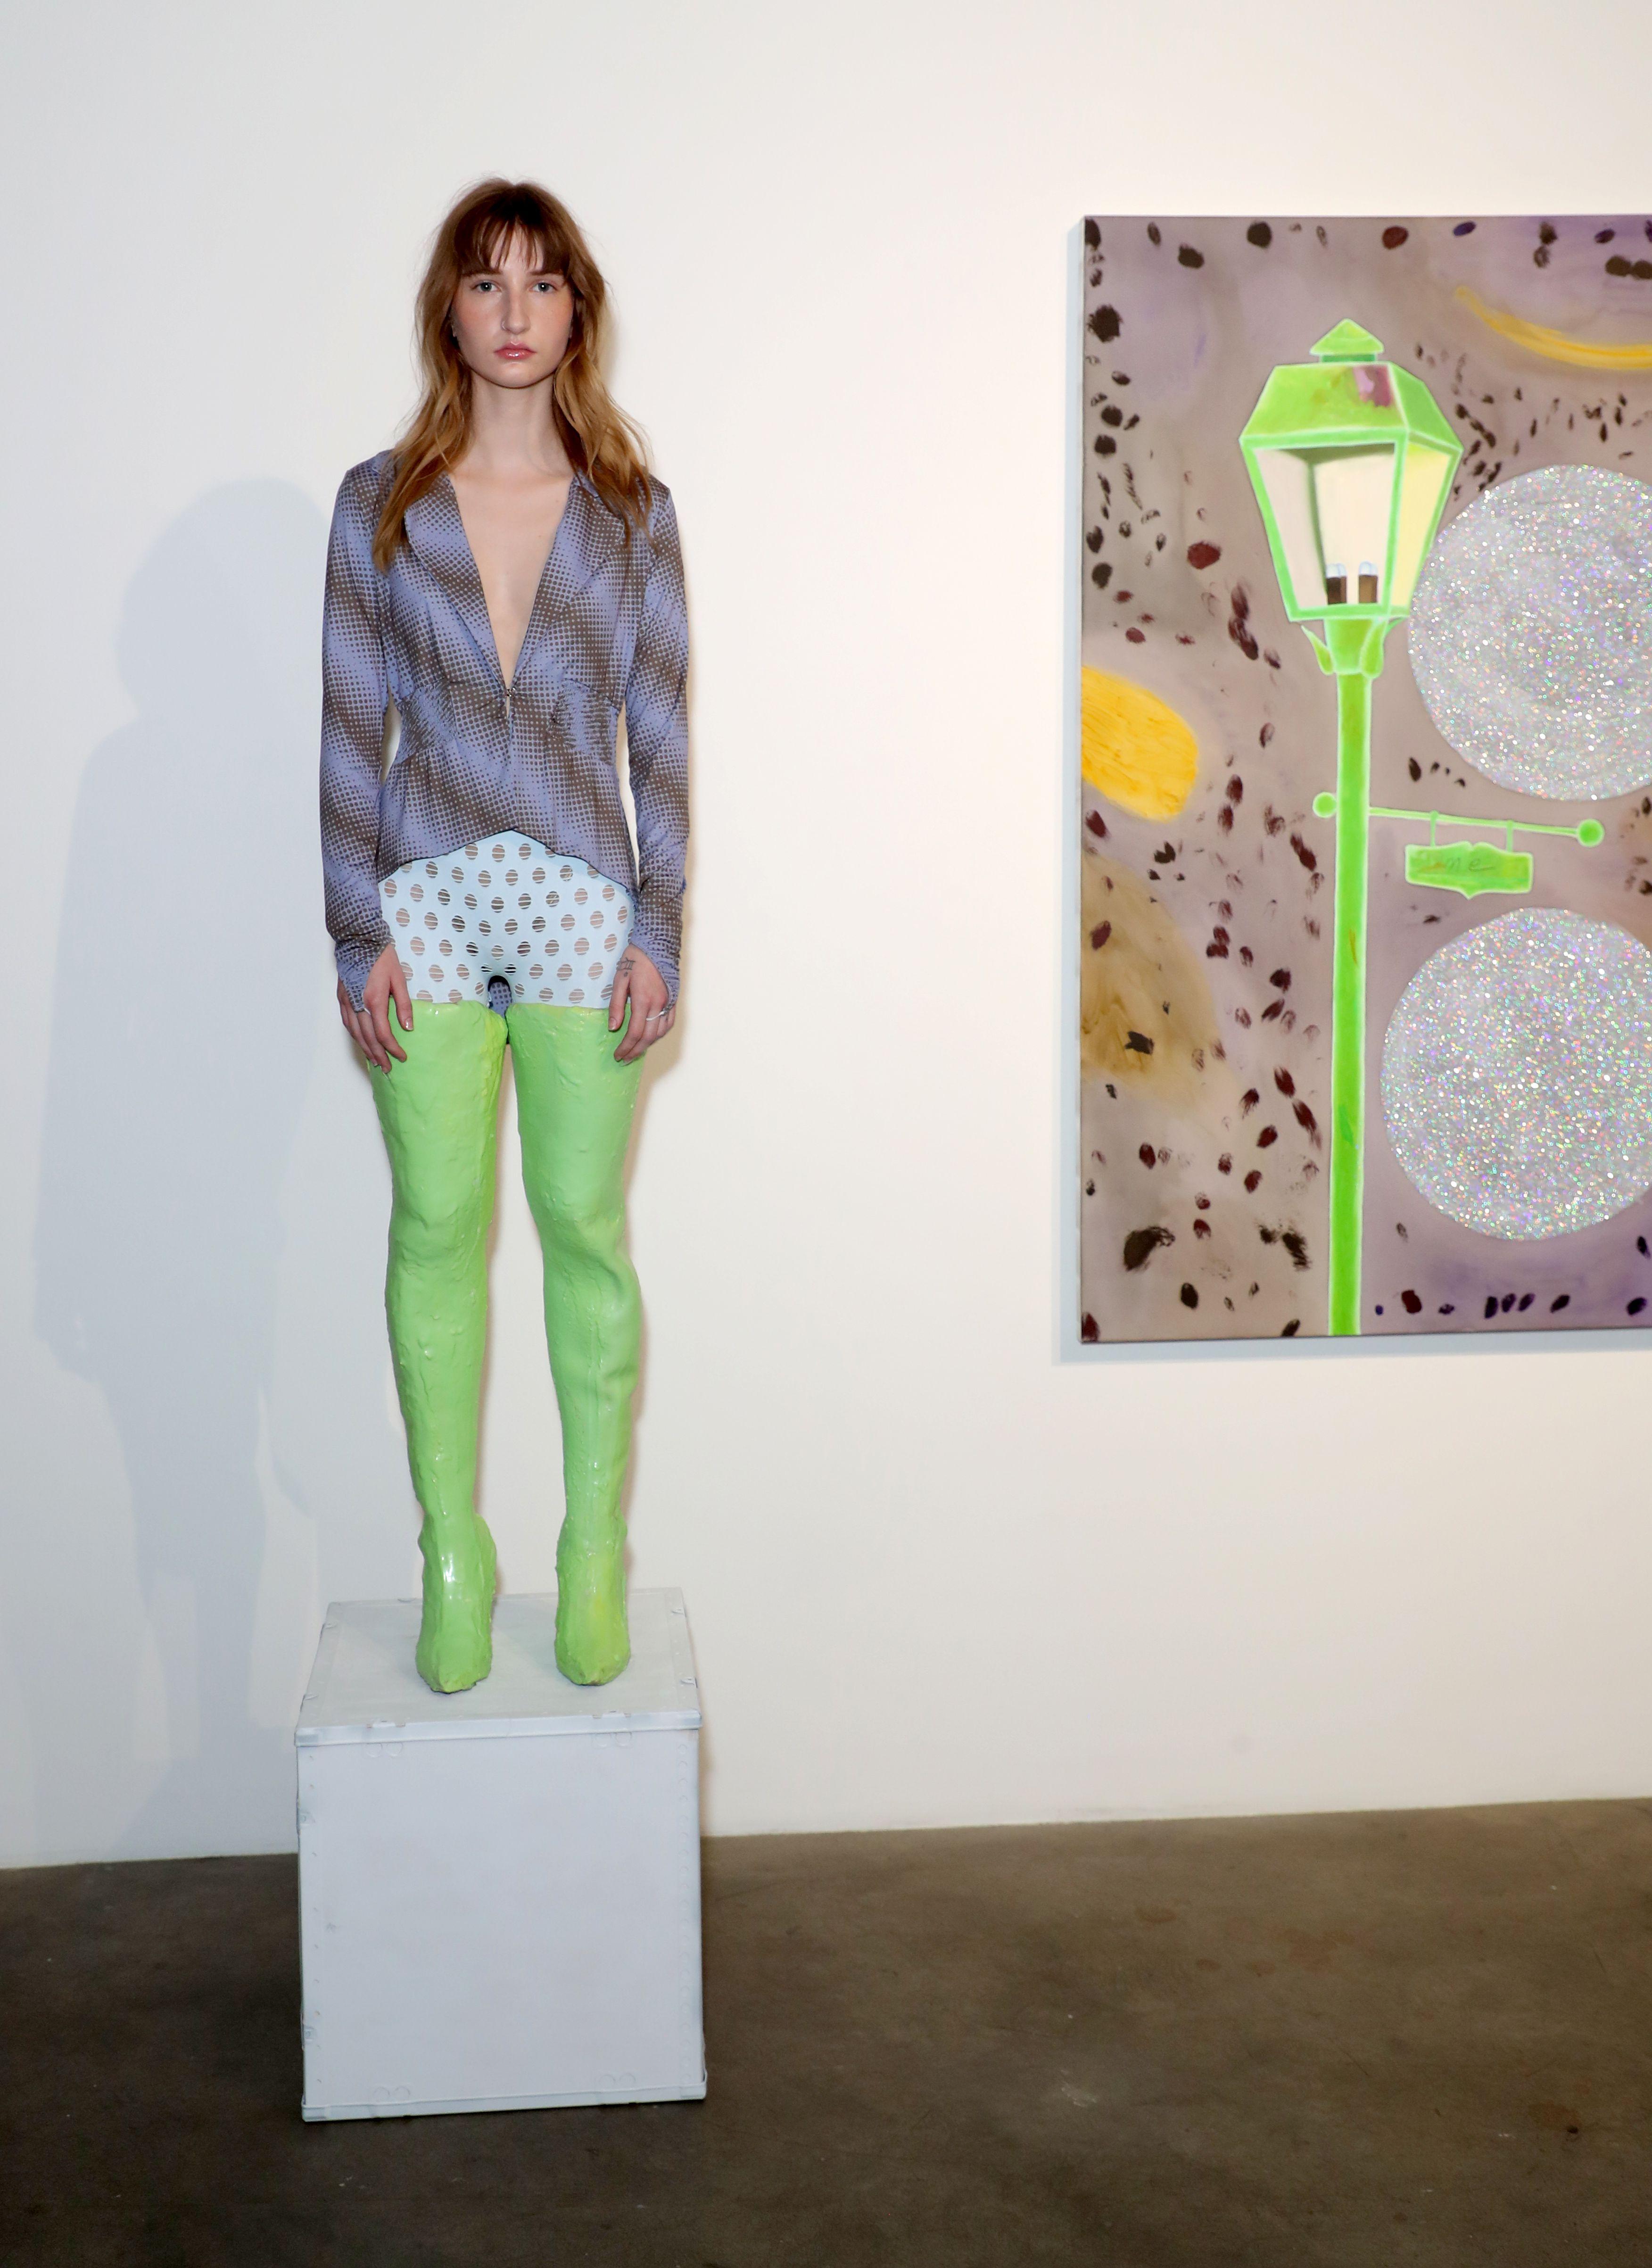 ModelMaisie Wilen Event, Presentation, Night Gallery, Los Angeles, USA - 05 Jun 2019